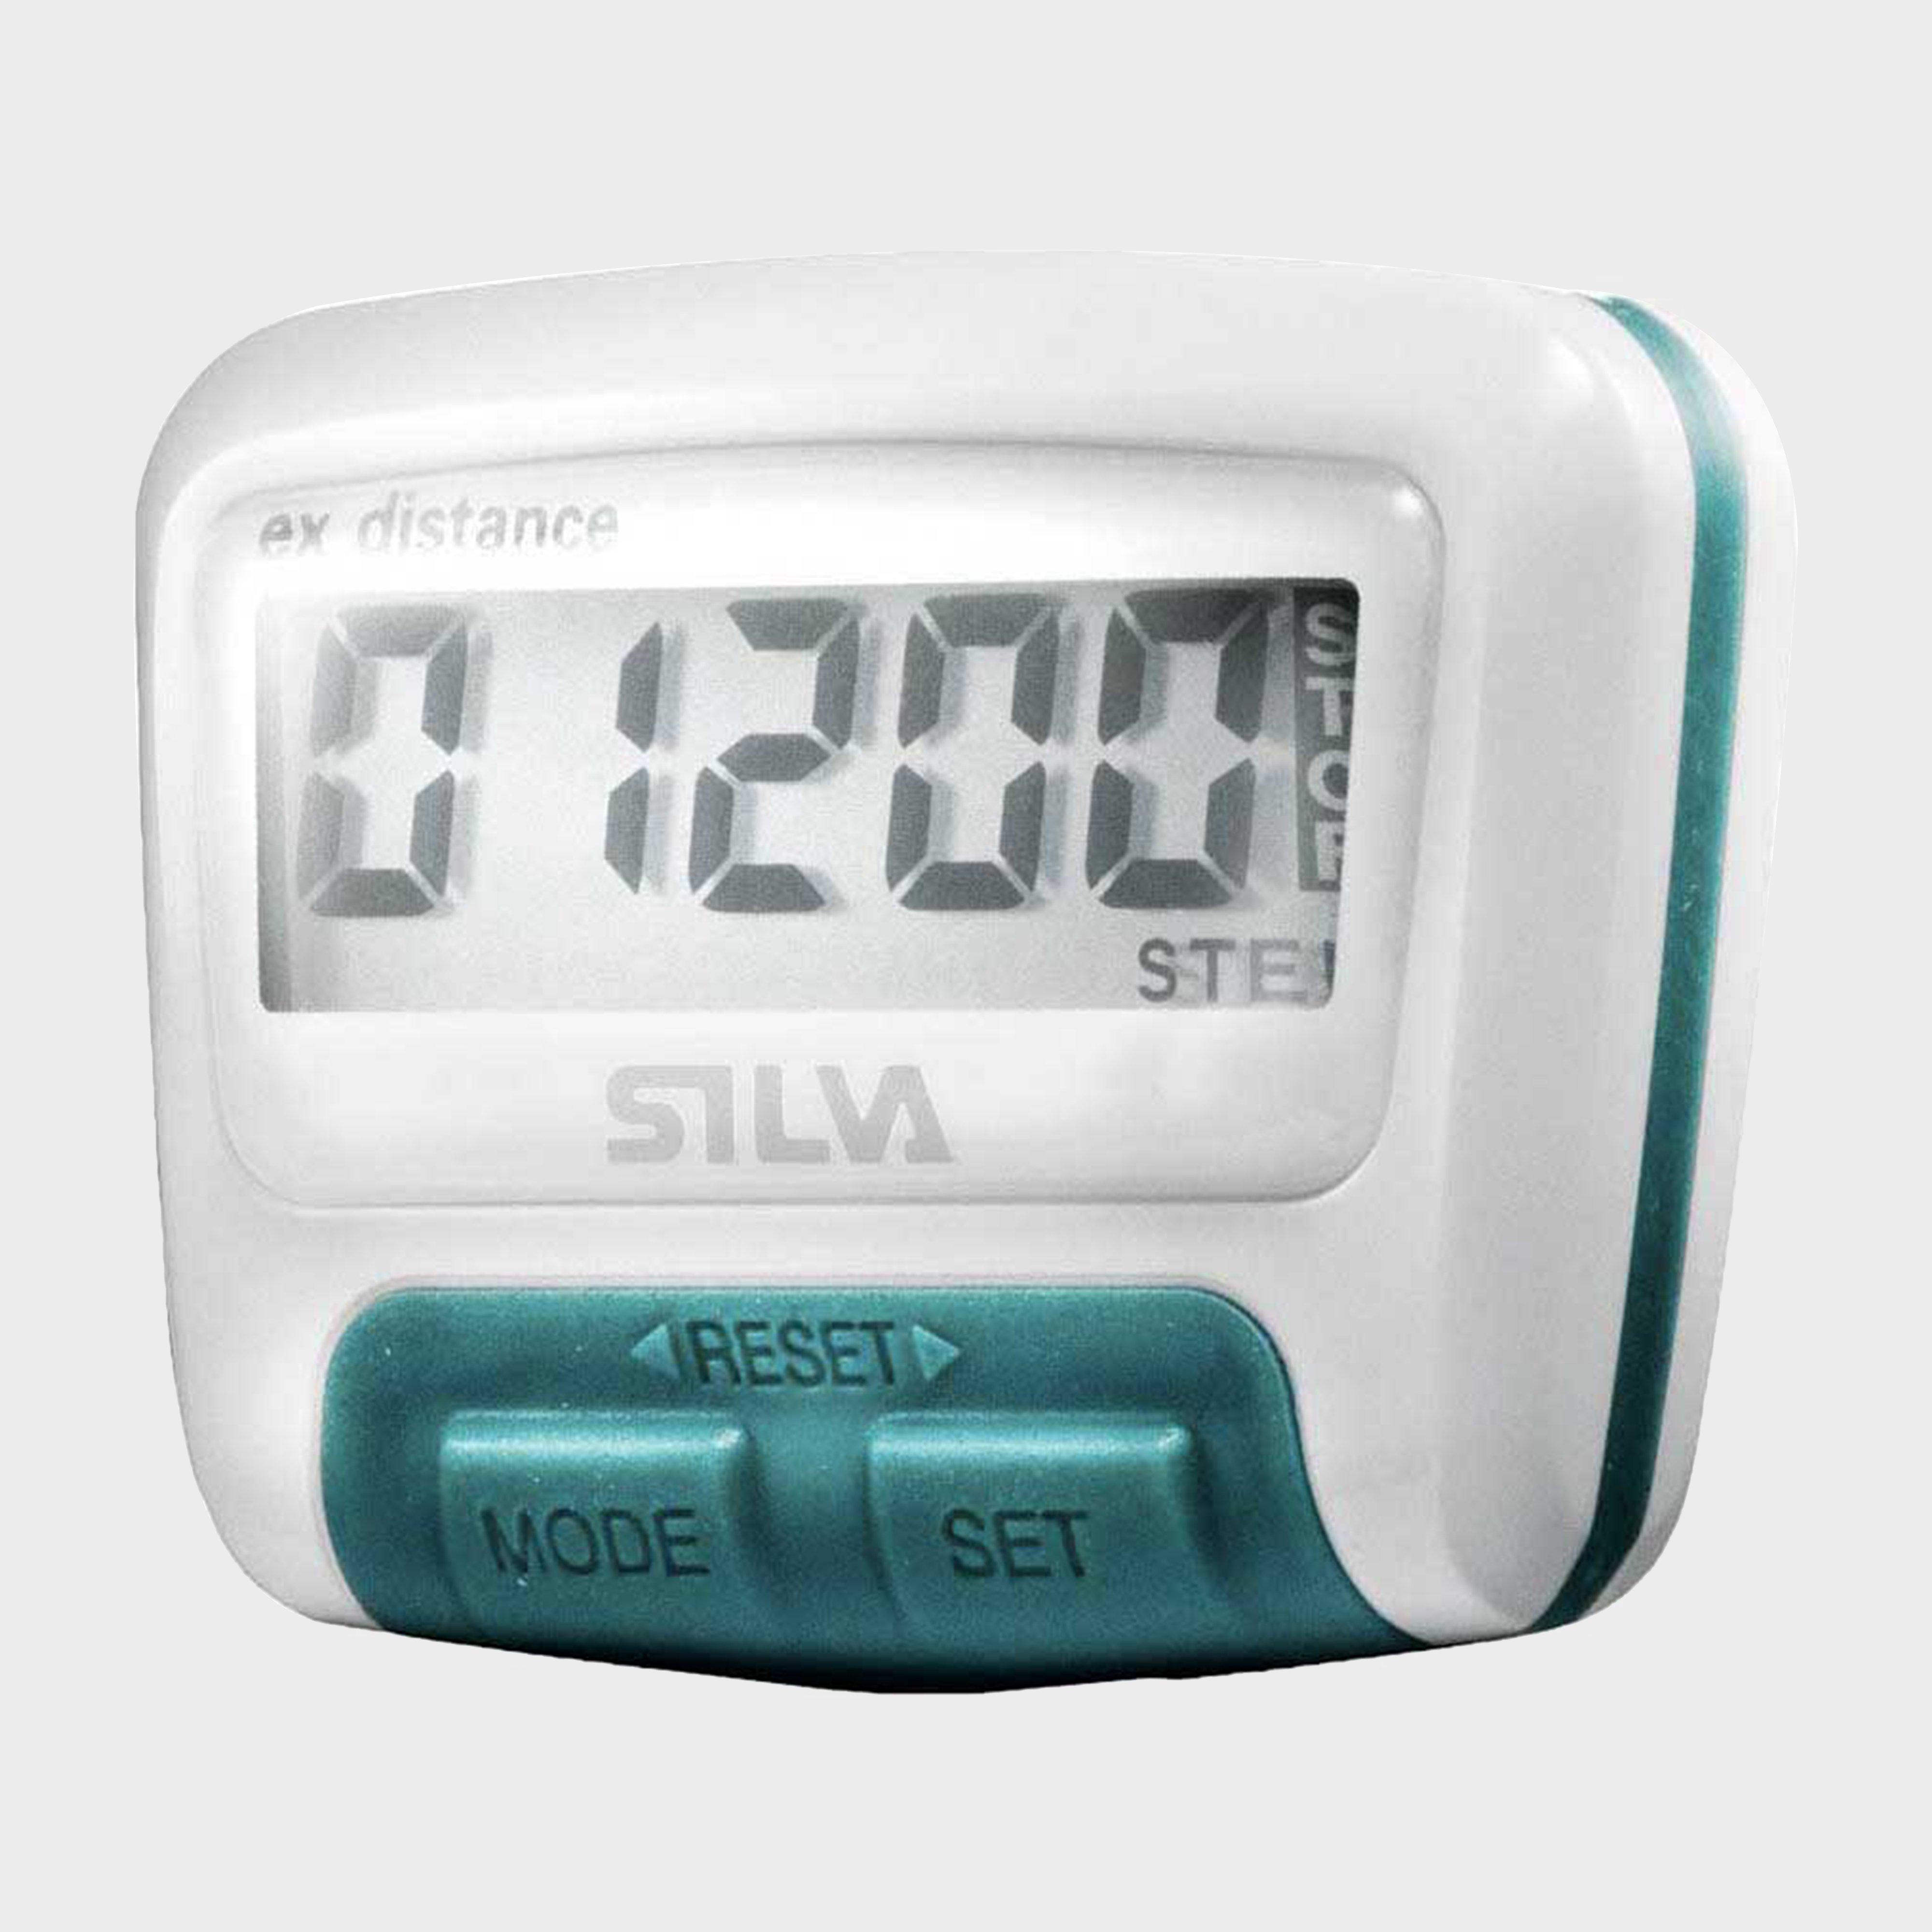 Silva Ex Distance Pedometer White